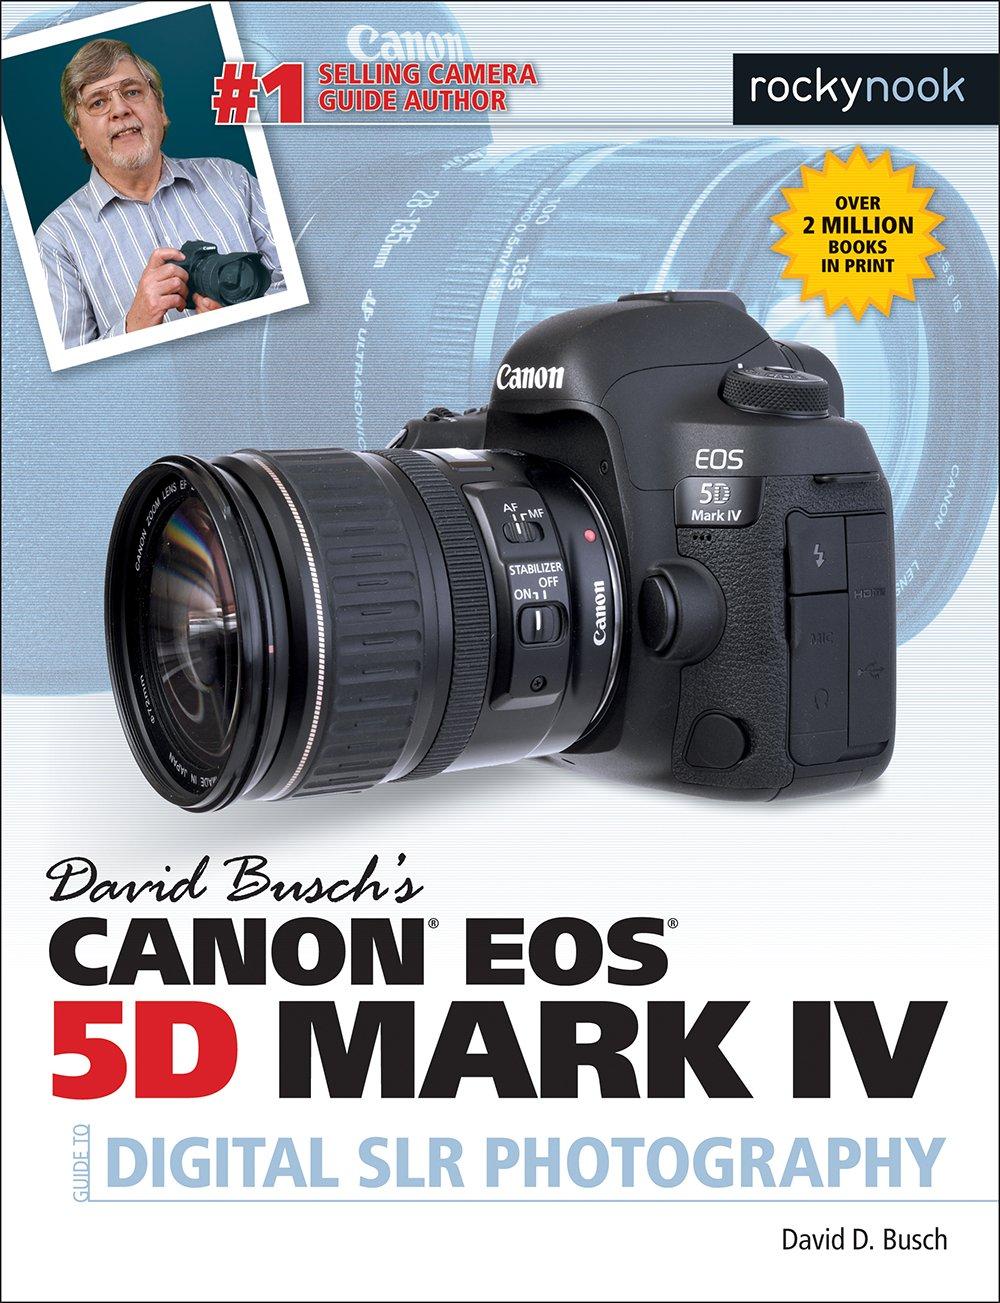 david busch s canon 5d mark iv guide to digital slr photography rh amazon com Top 10 Digital Photography Books Top 10 Digital Photography Books